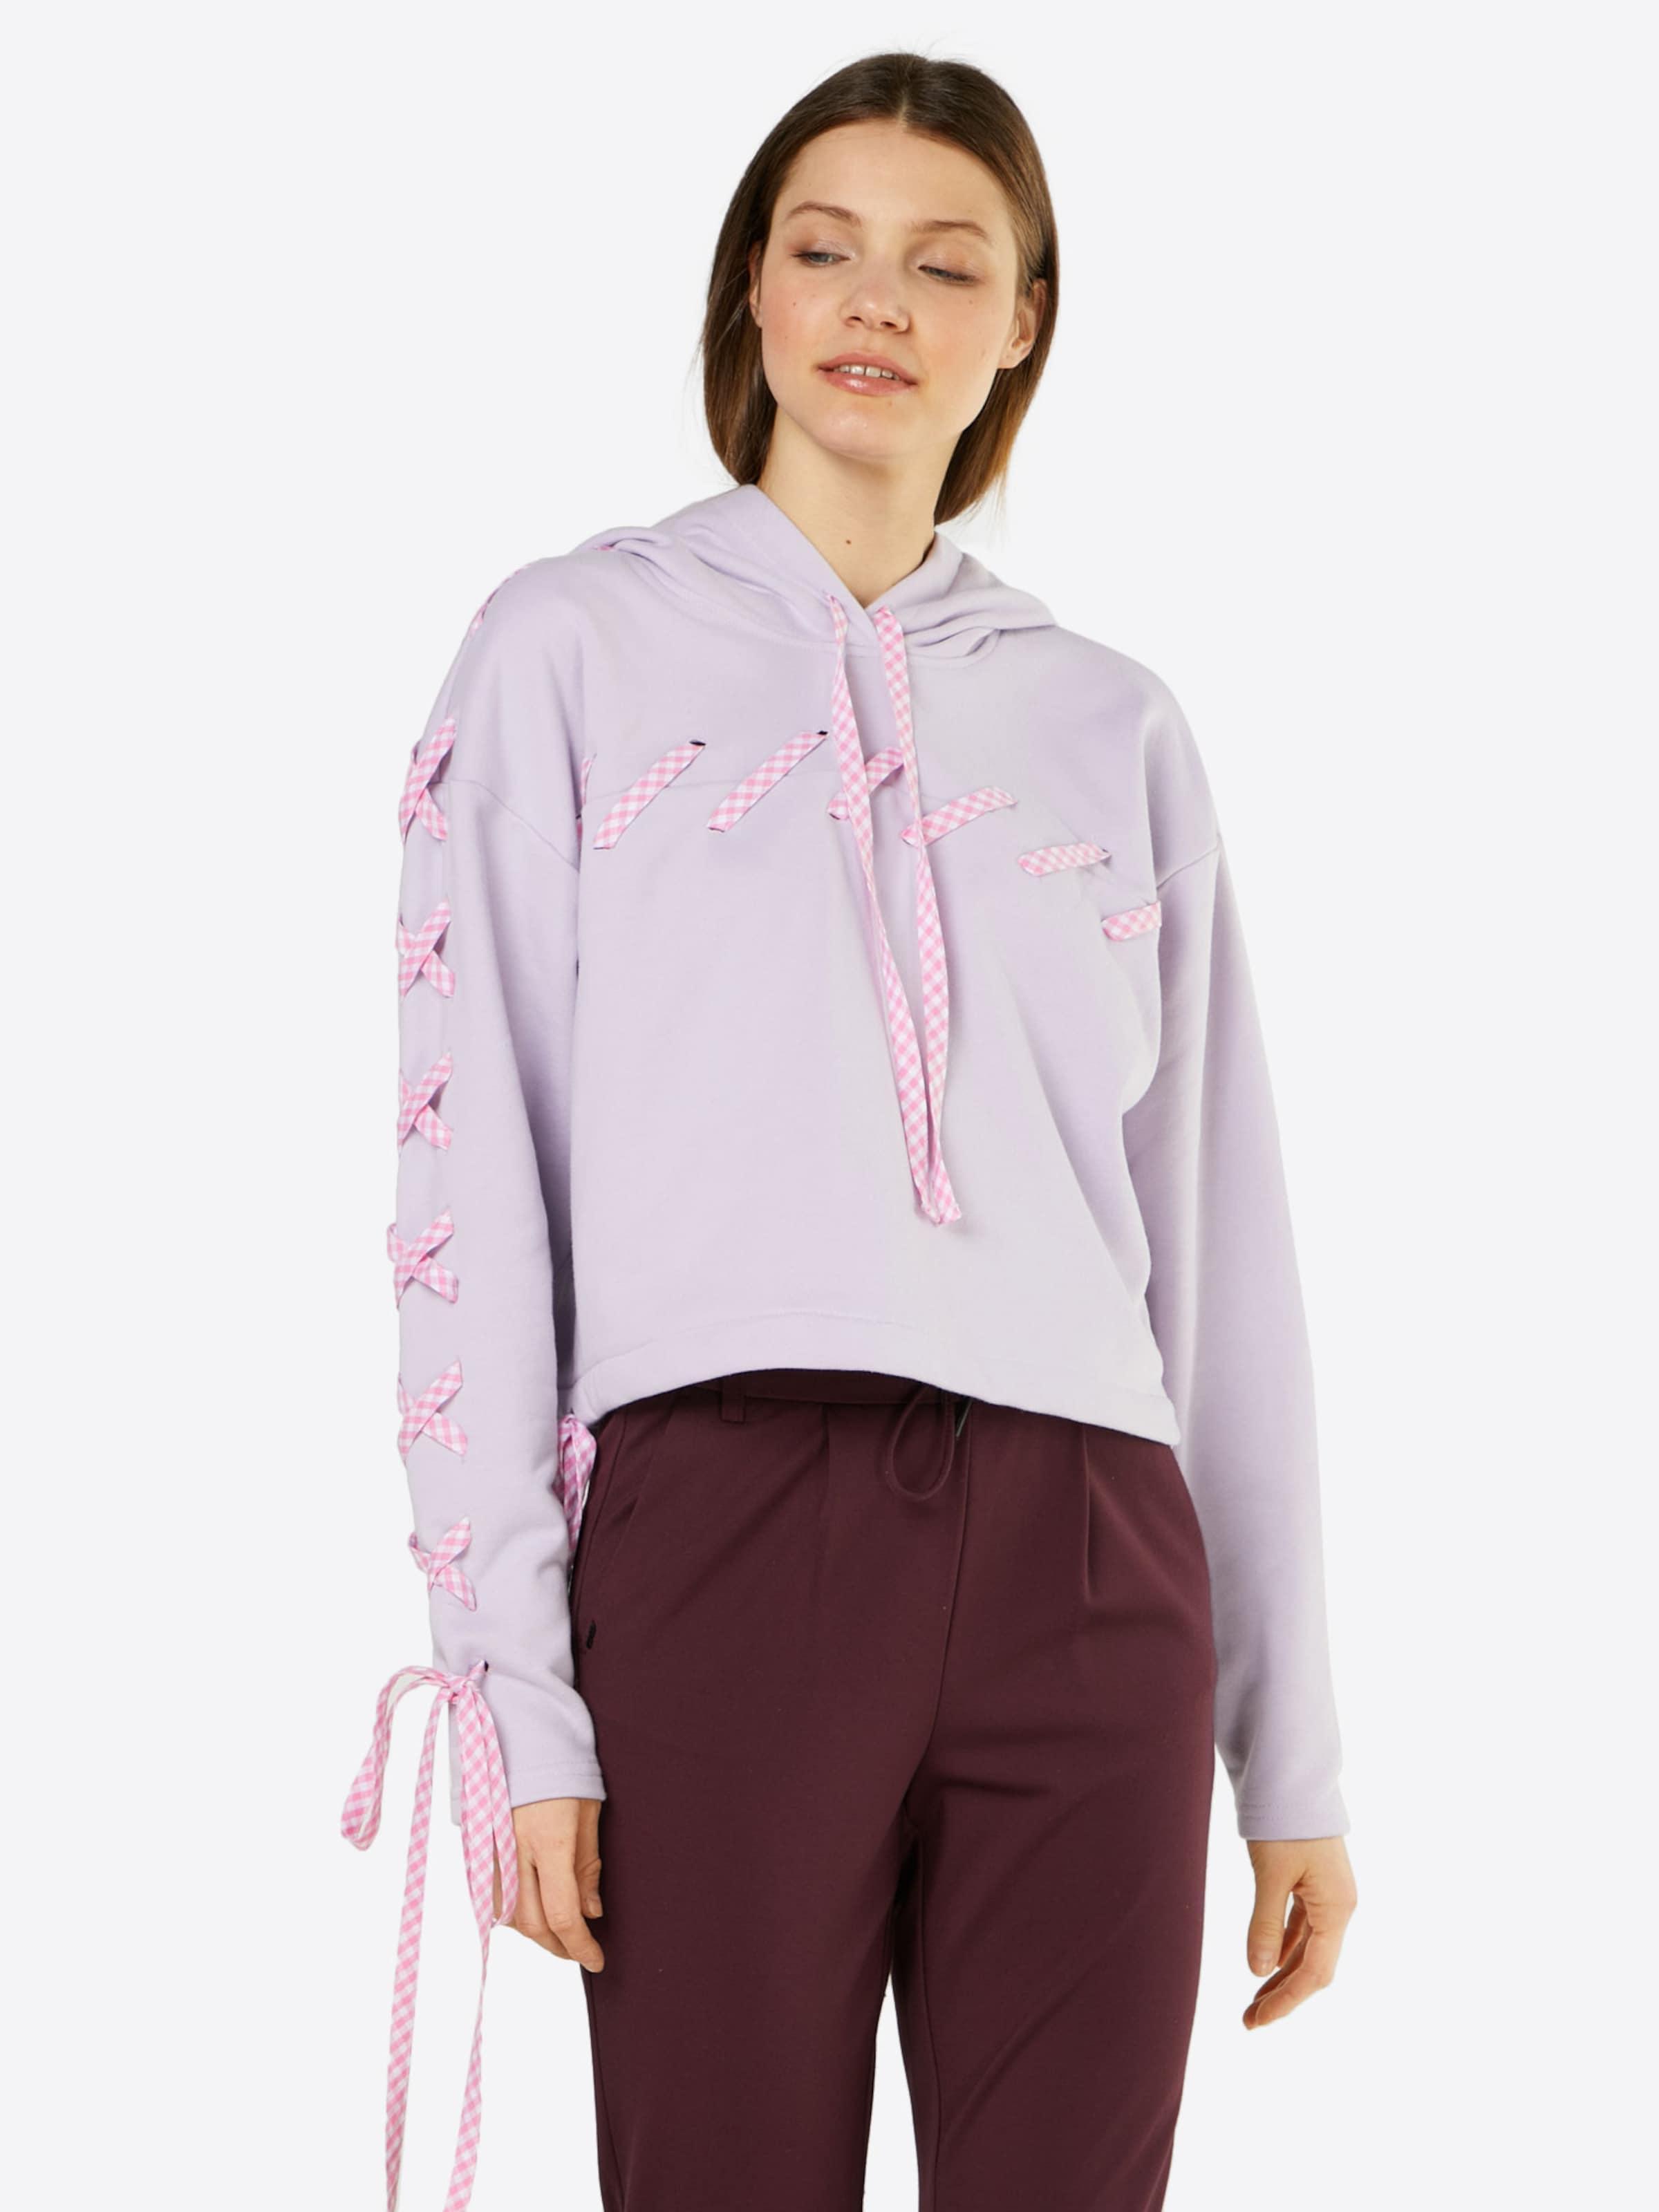 Lost Sweat En 'lacing' Lilas Ink shirt mwnNv80